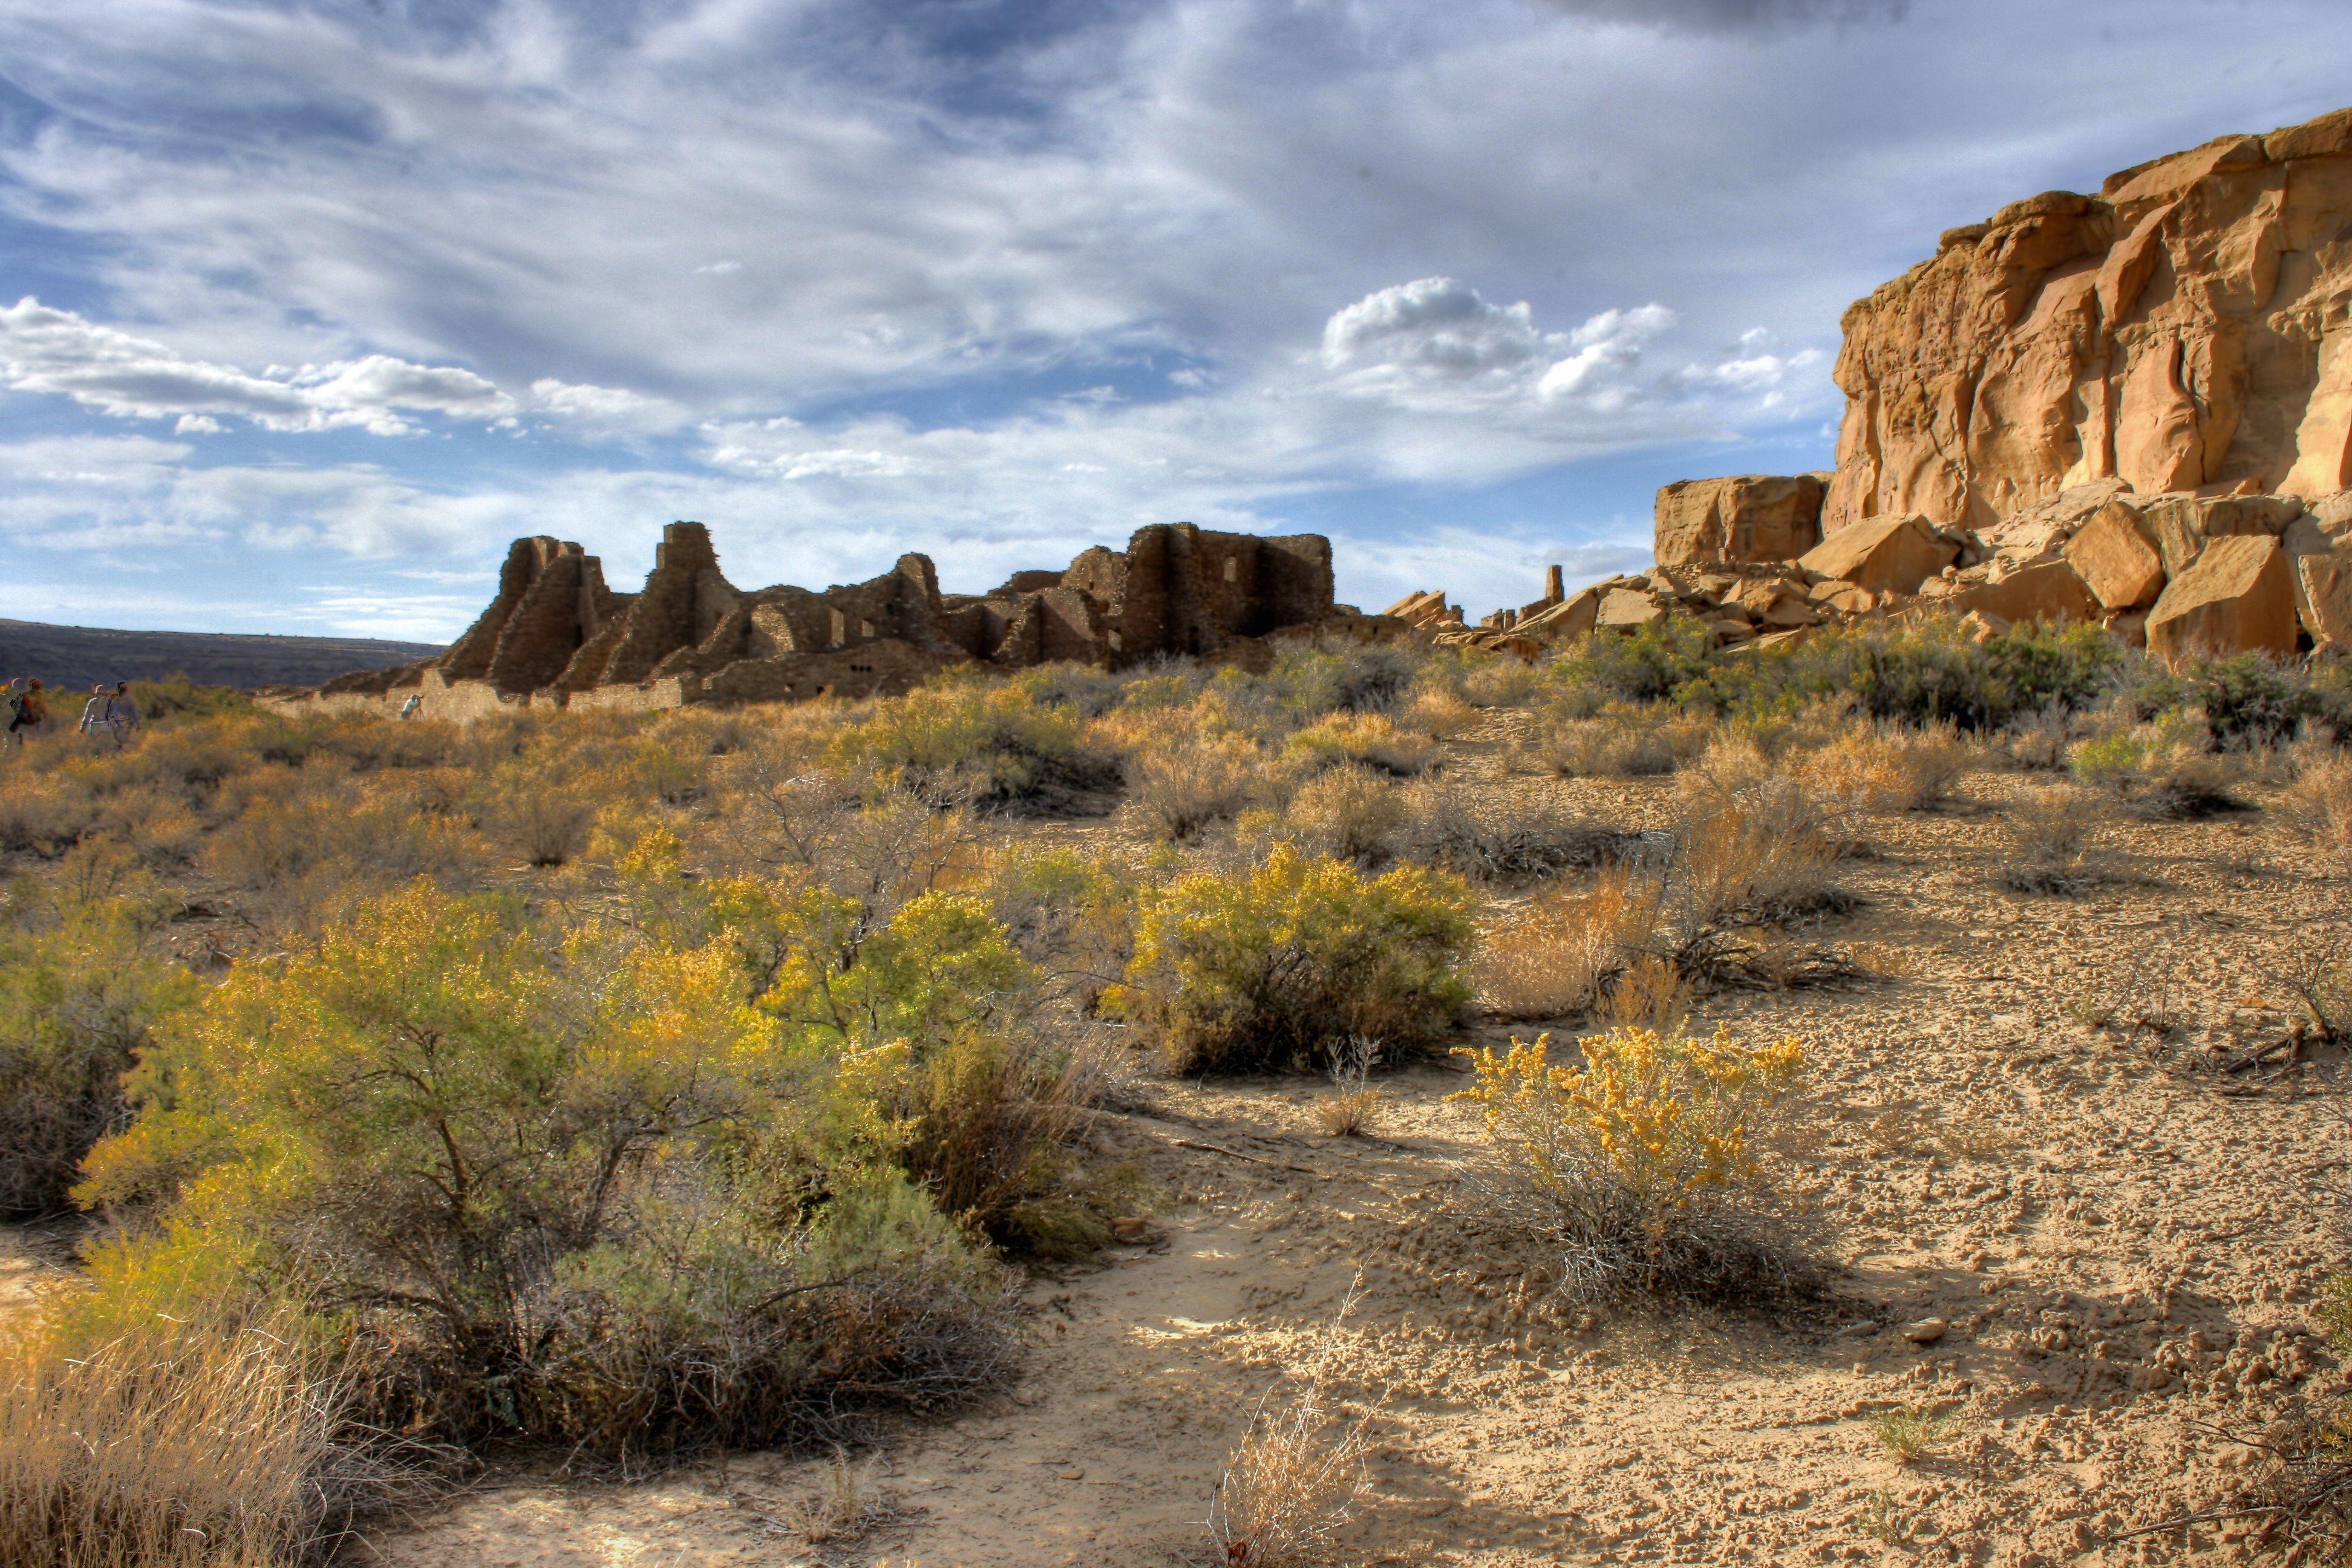 An Introduction to Anasazi Puebloan Societies